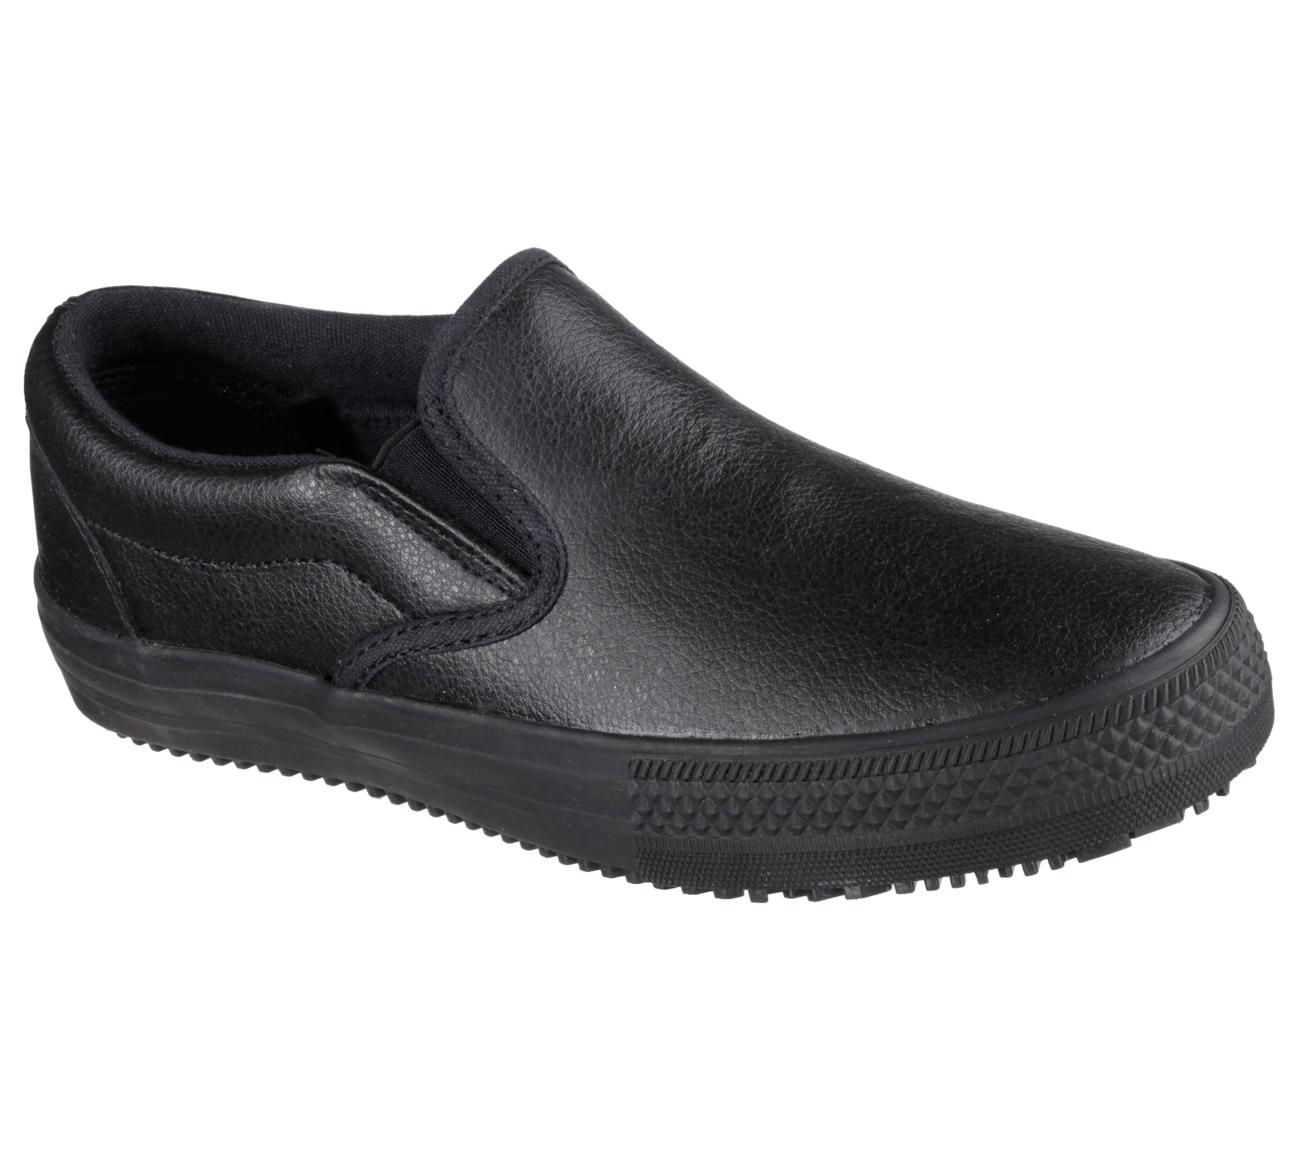 Sandlot Plain Black Shoes